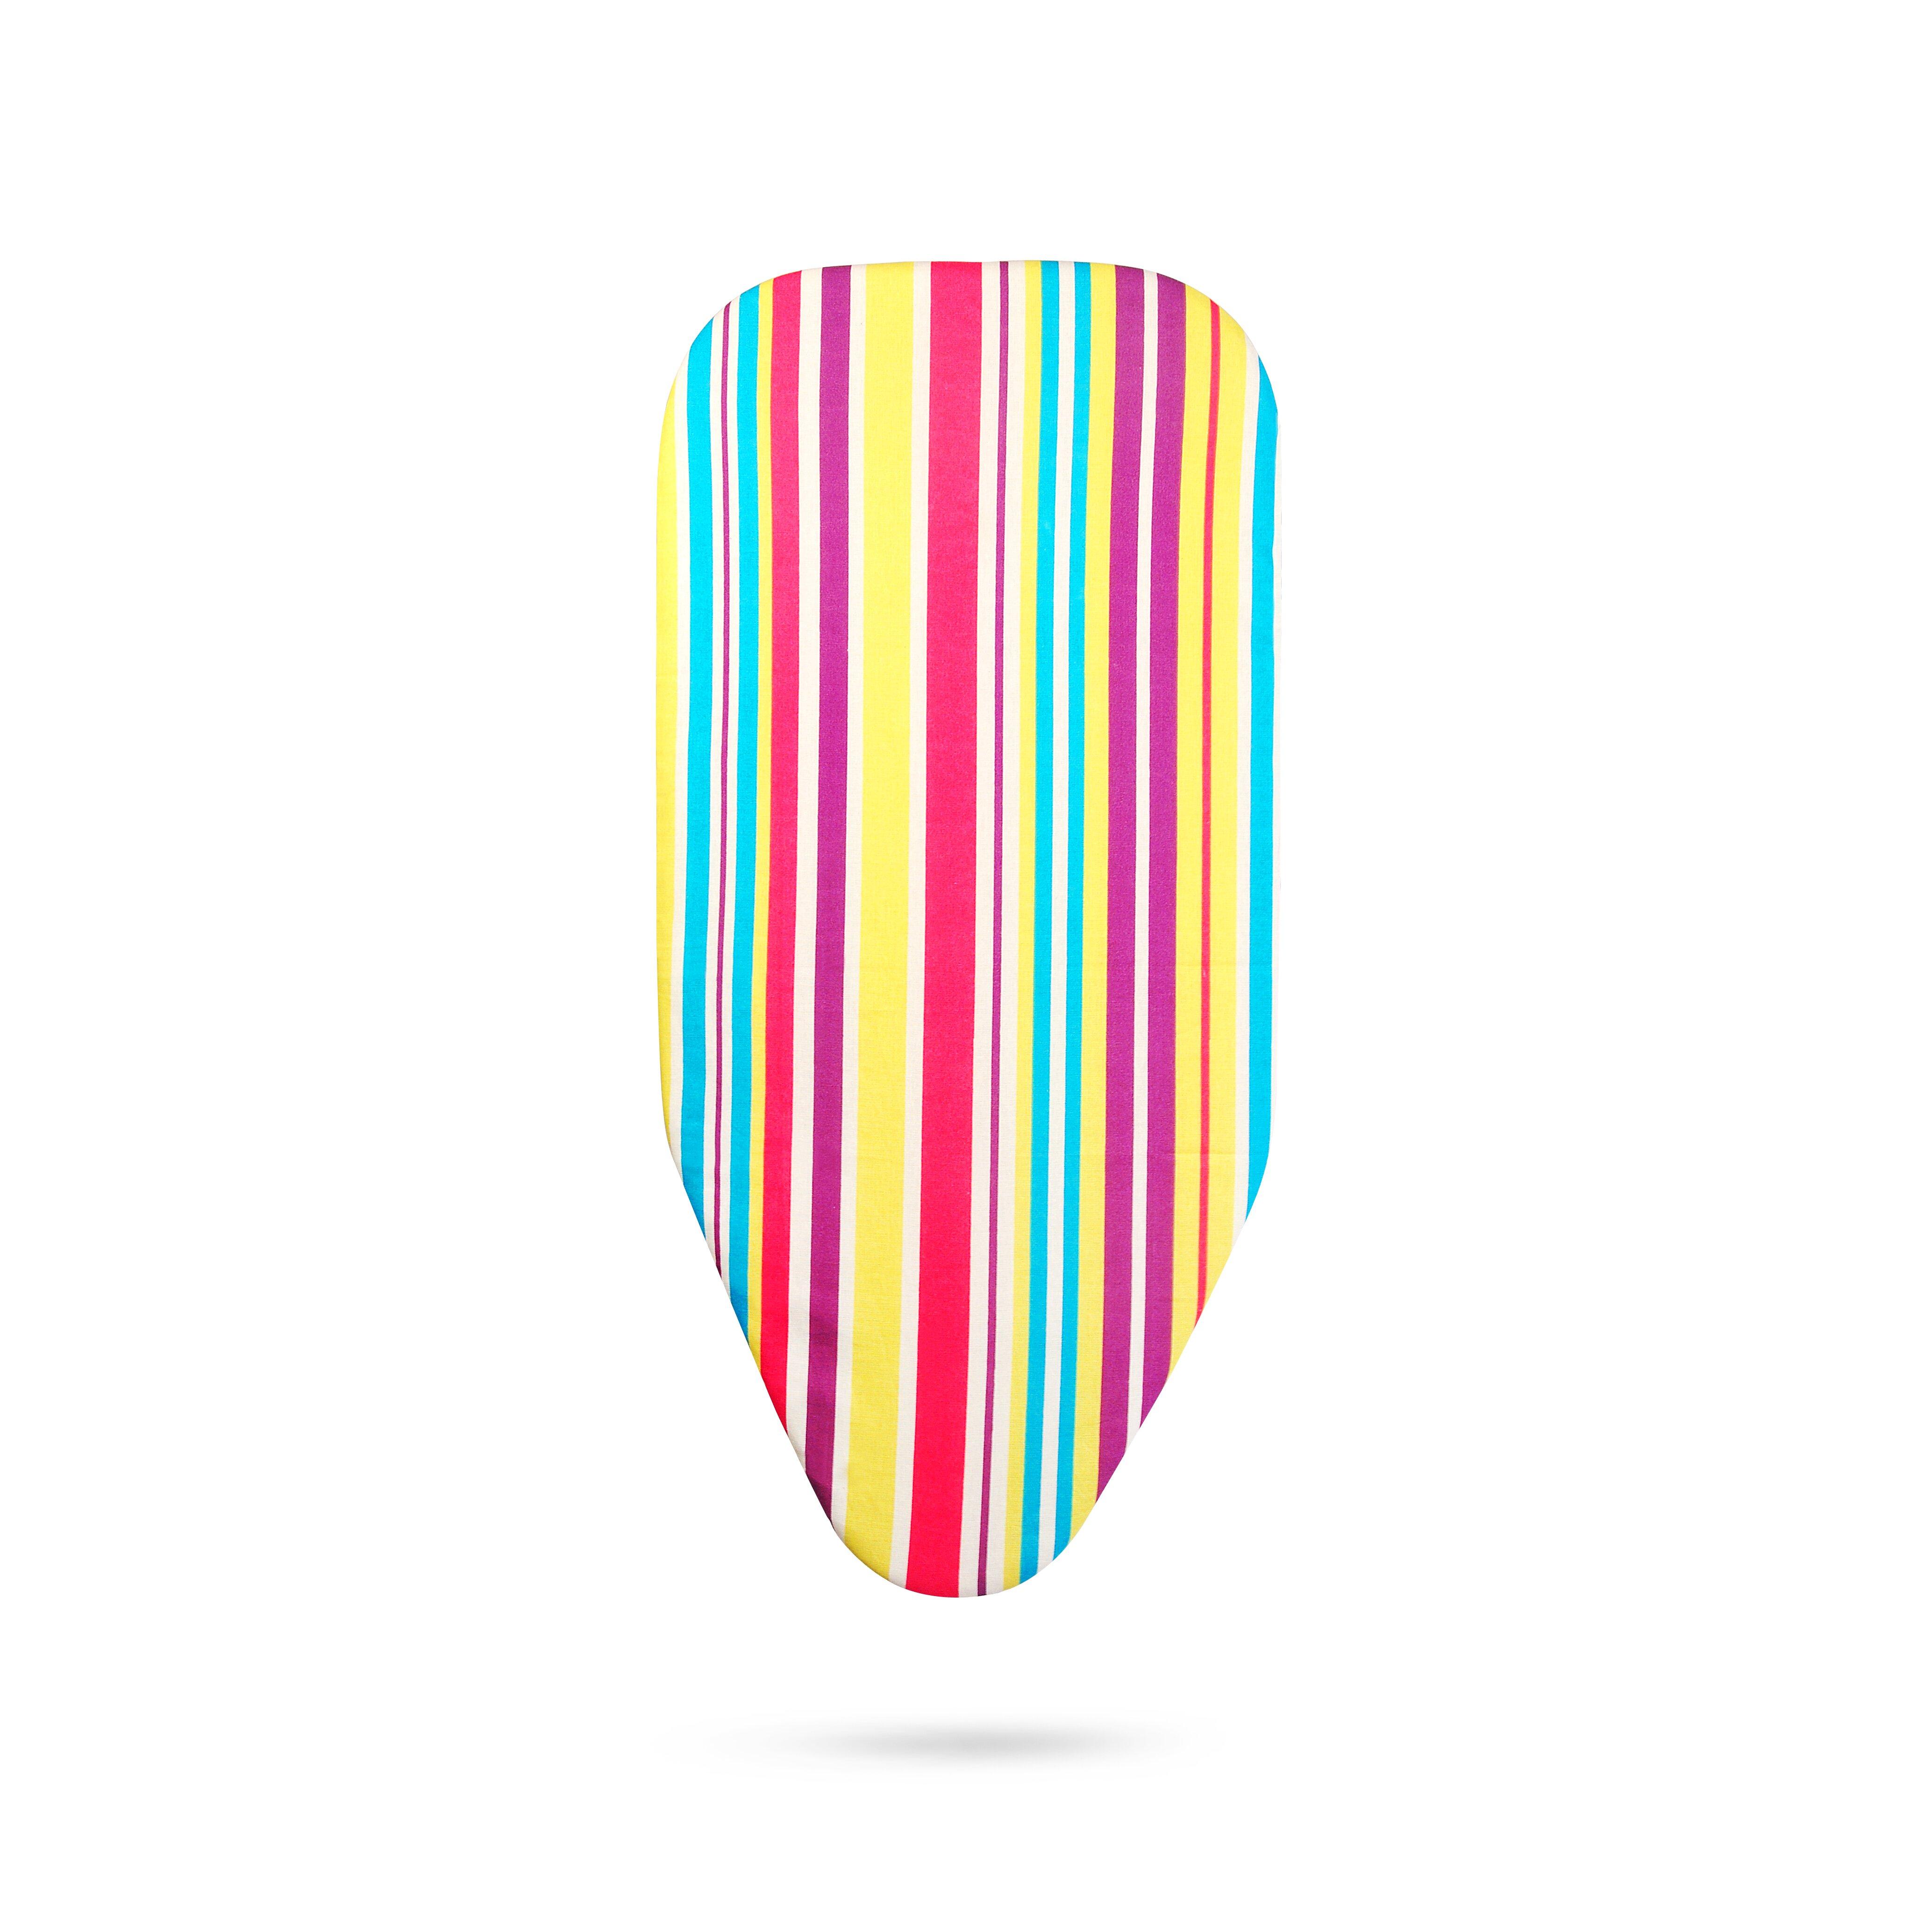 bonita small ironing board cover wayfair. Black Bedroom Furniture Sets. Home Design Ideas